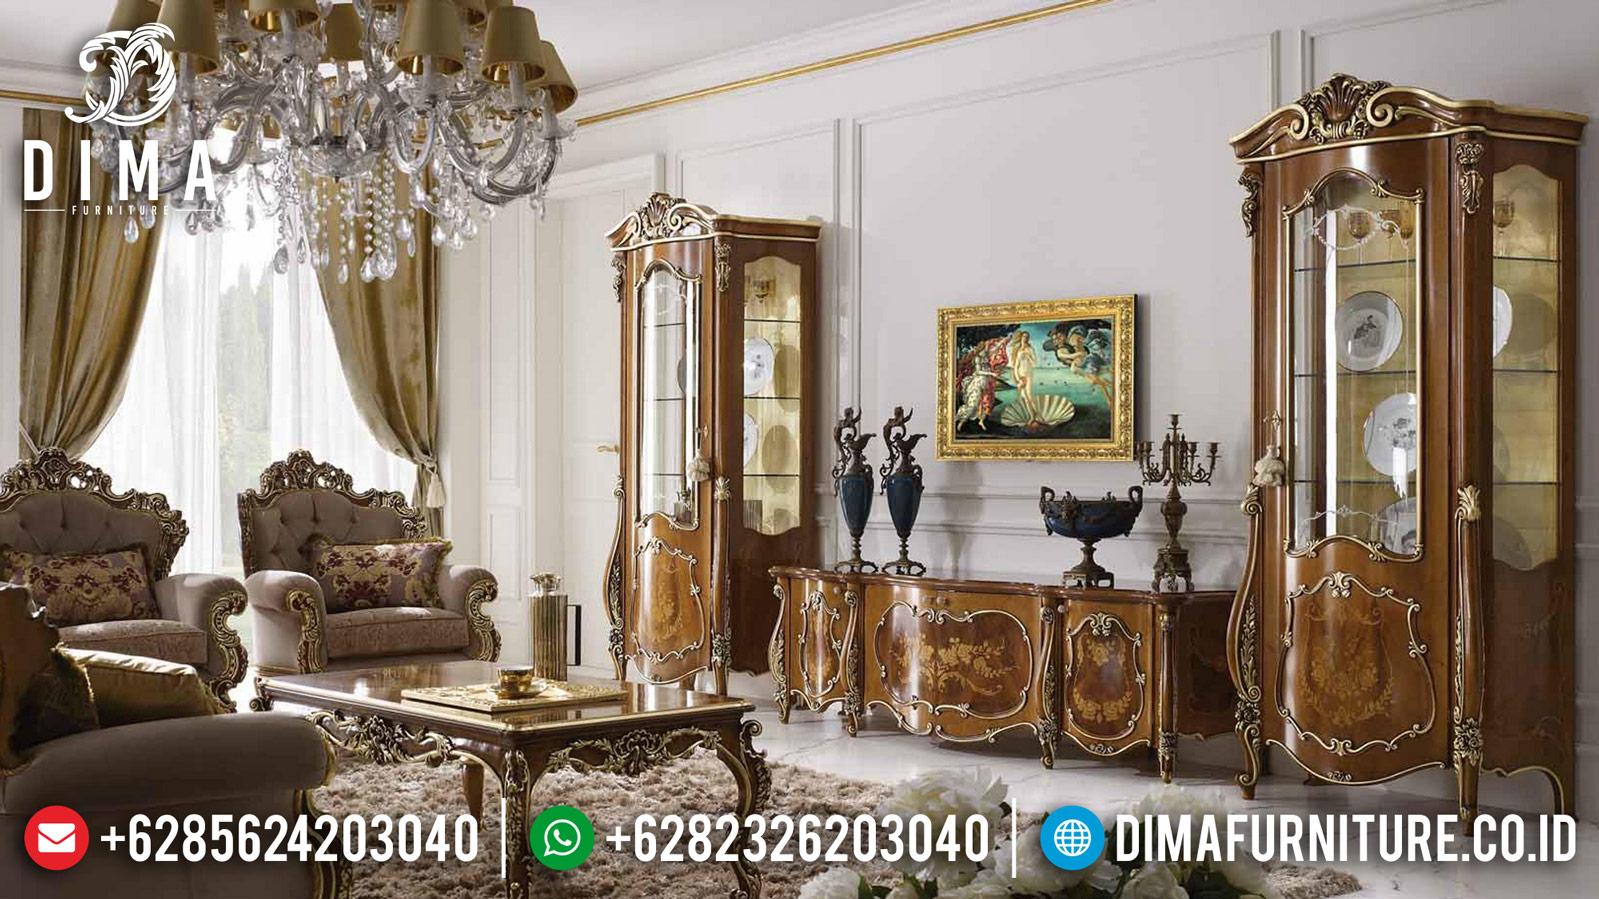 Glorious Bufet TV Jati Ukiran Luxury Classic Furniture Jepara Murah TTJ-1022